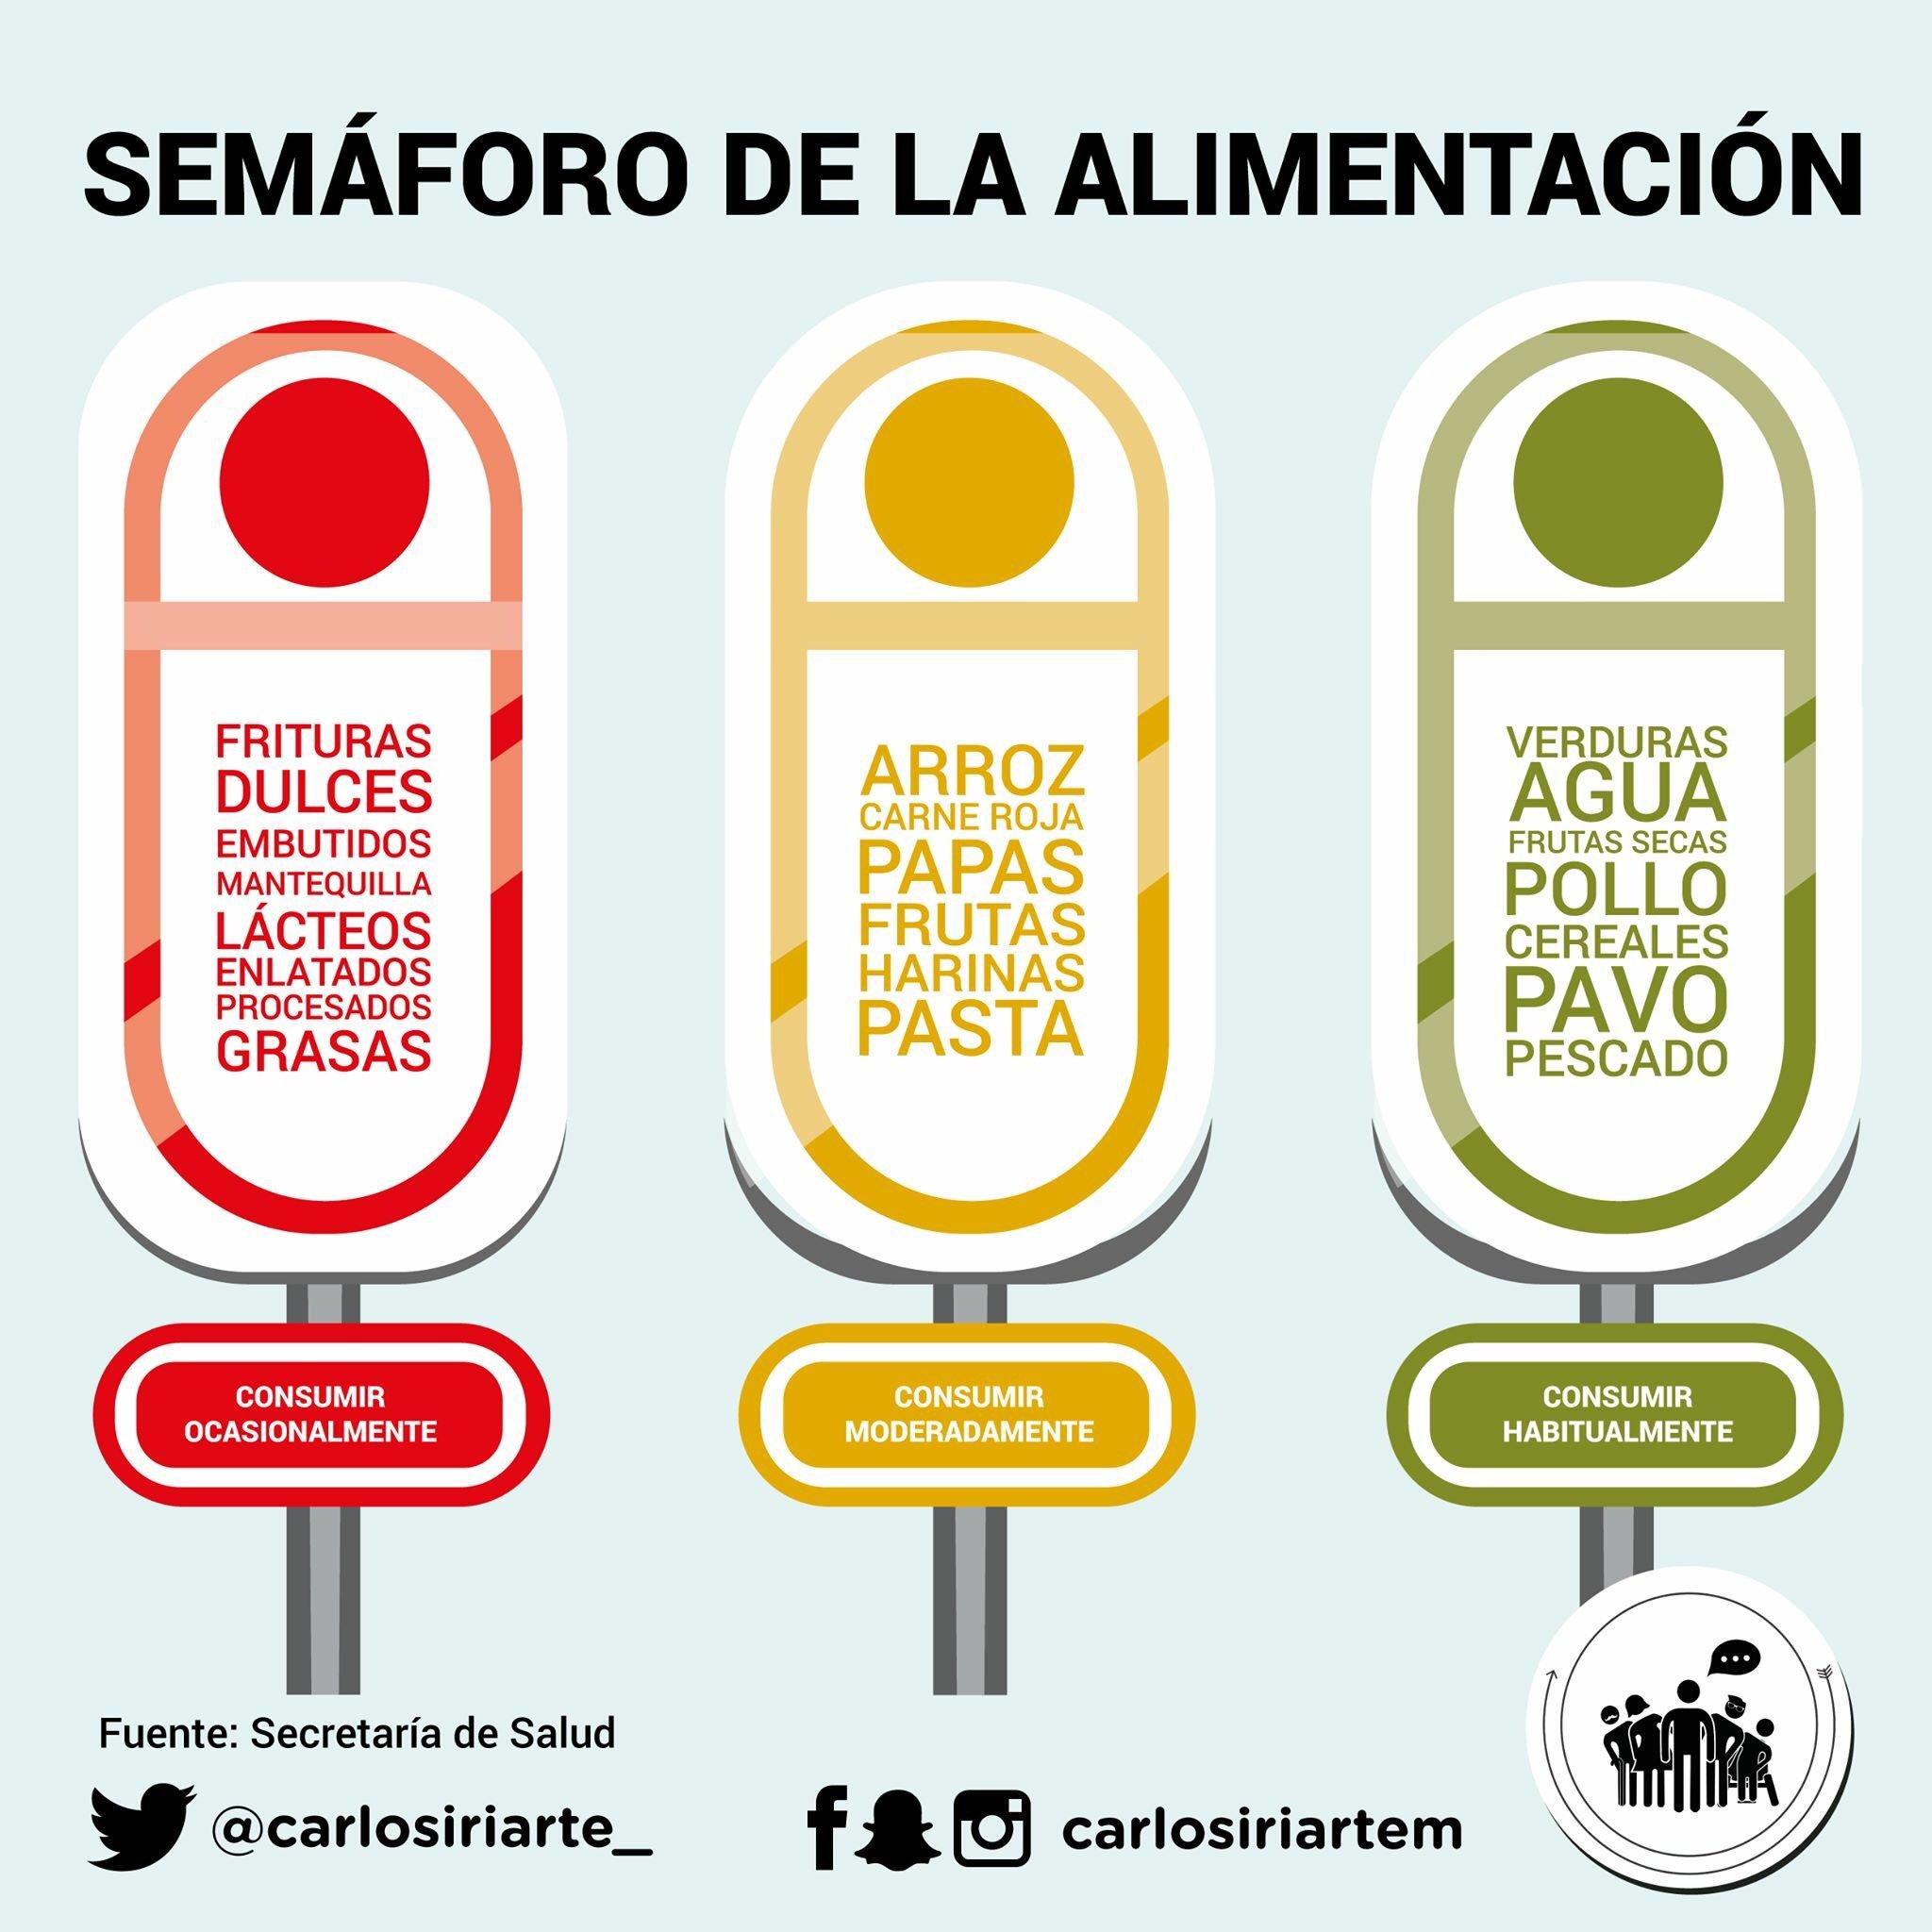 Carlos Iriarte on Twitter: